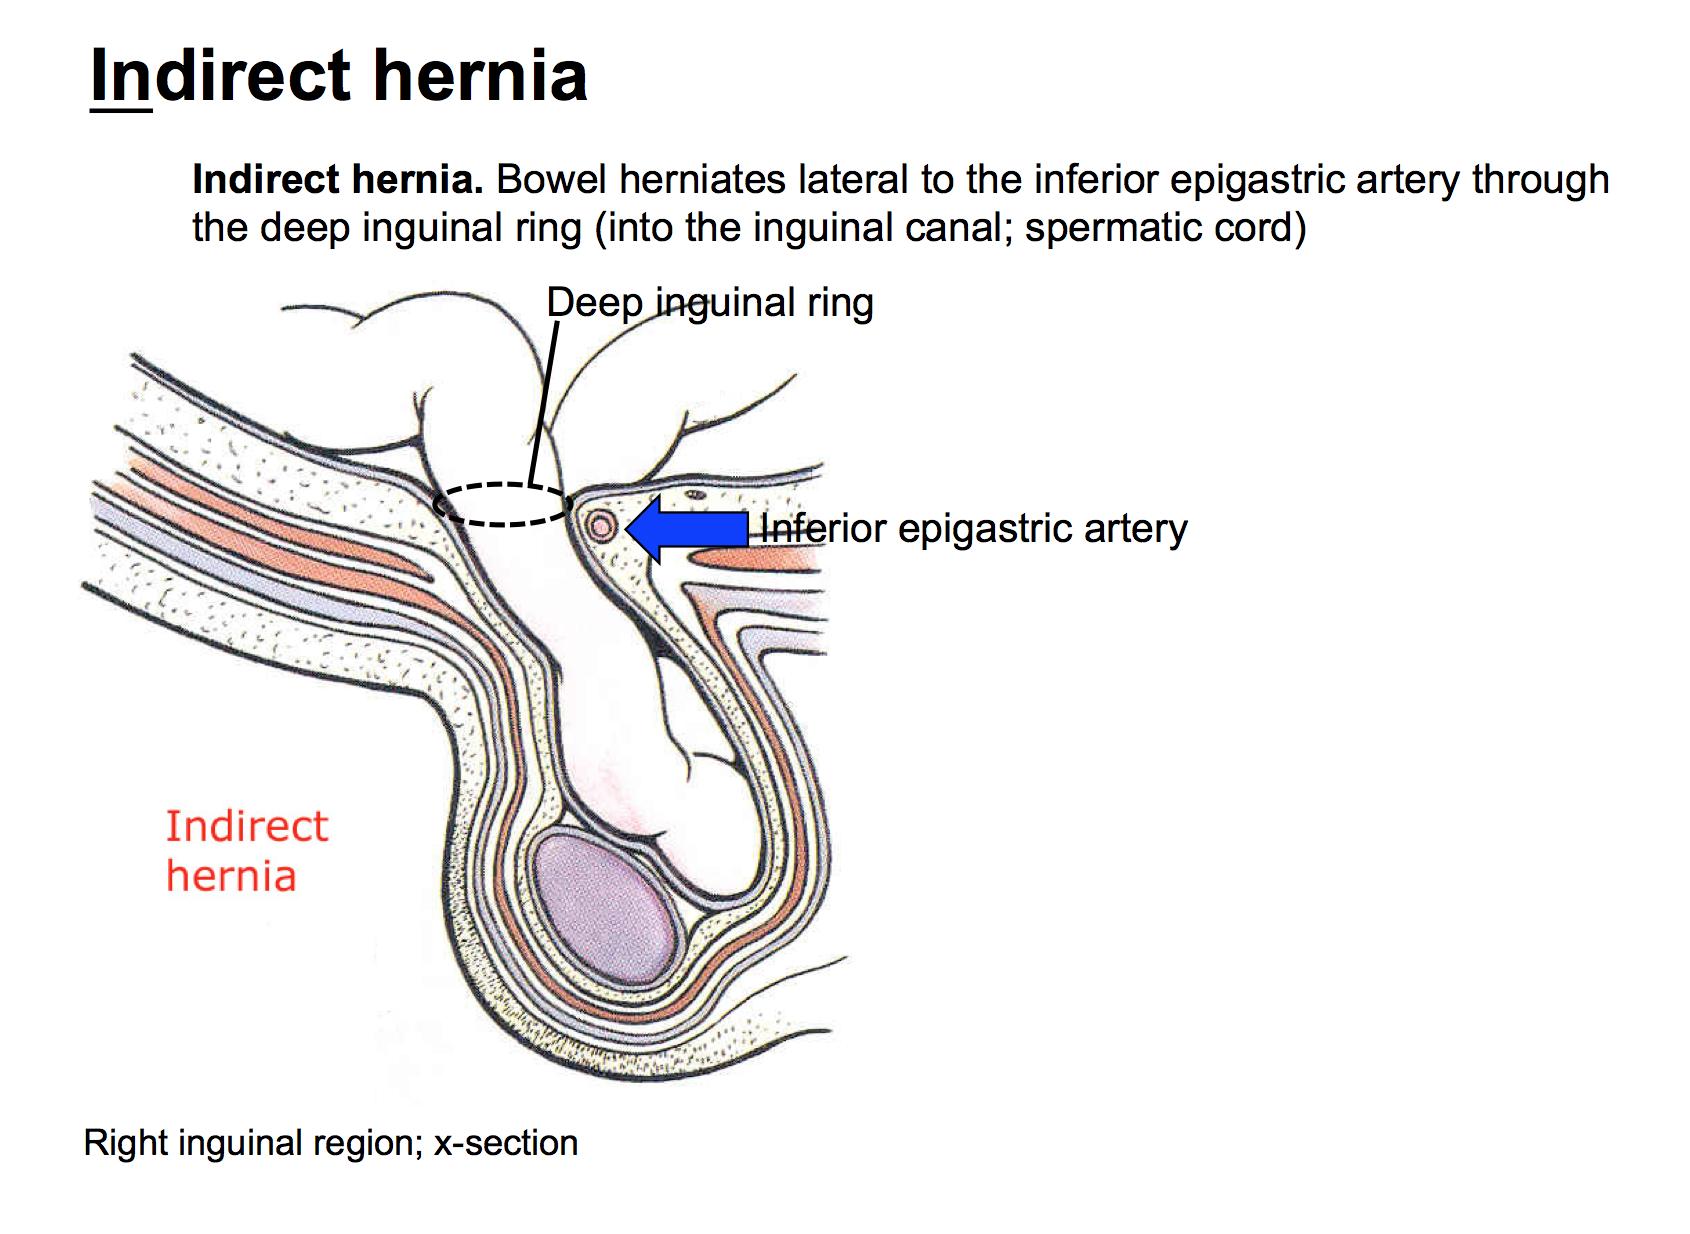 Week 6 Abdominal Wall Inguinal Region Anatomy Phase 1